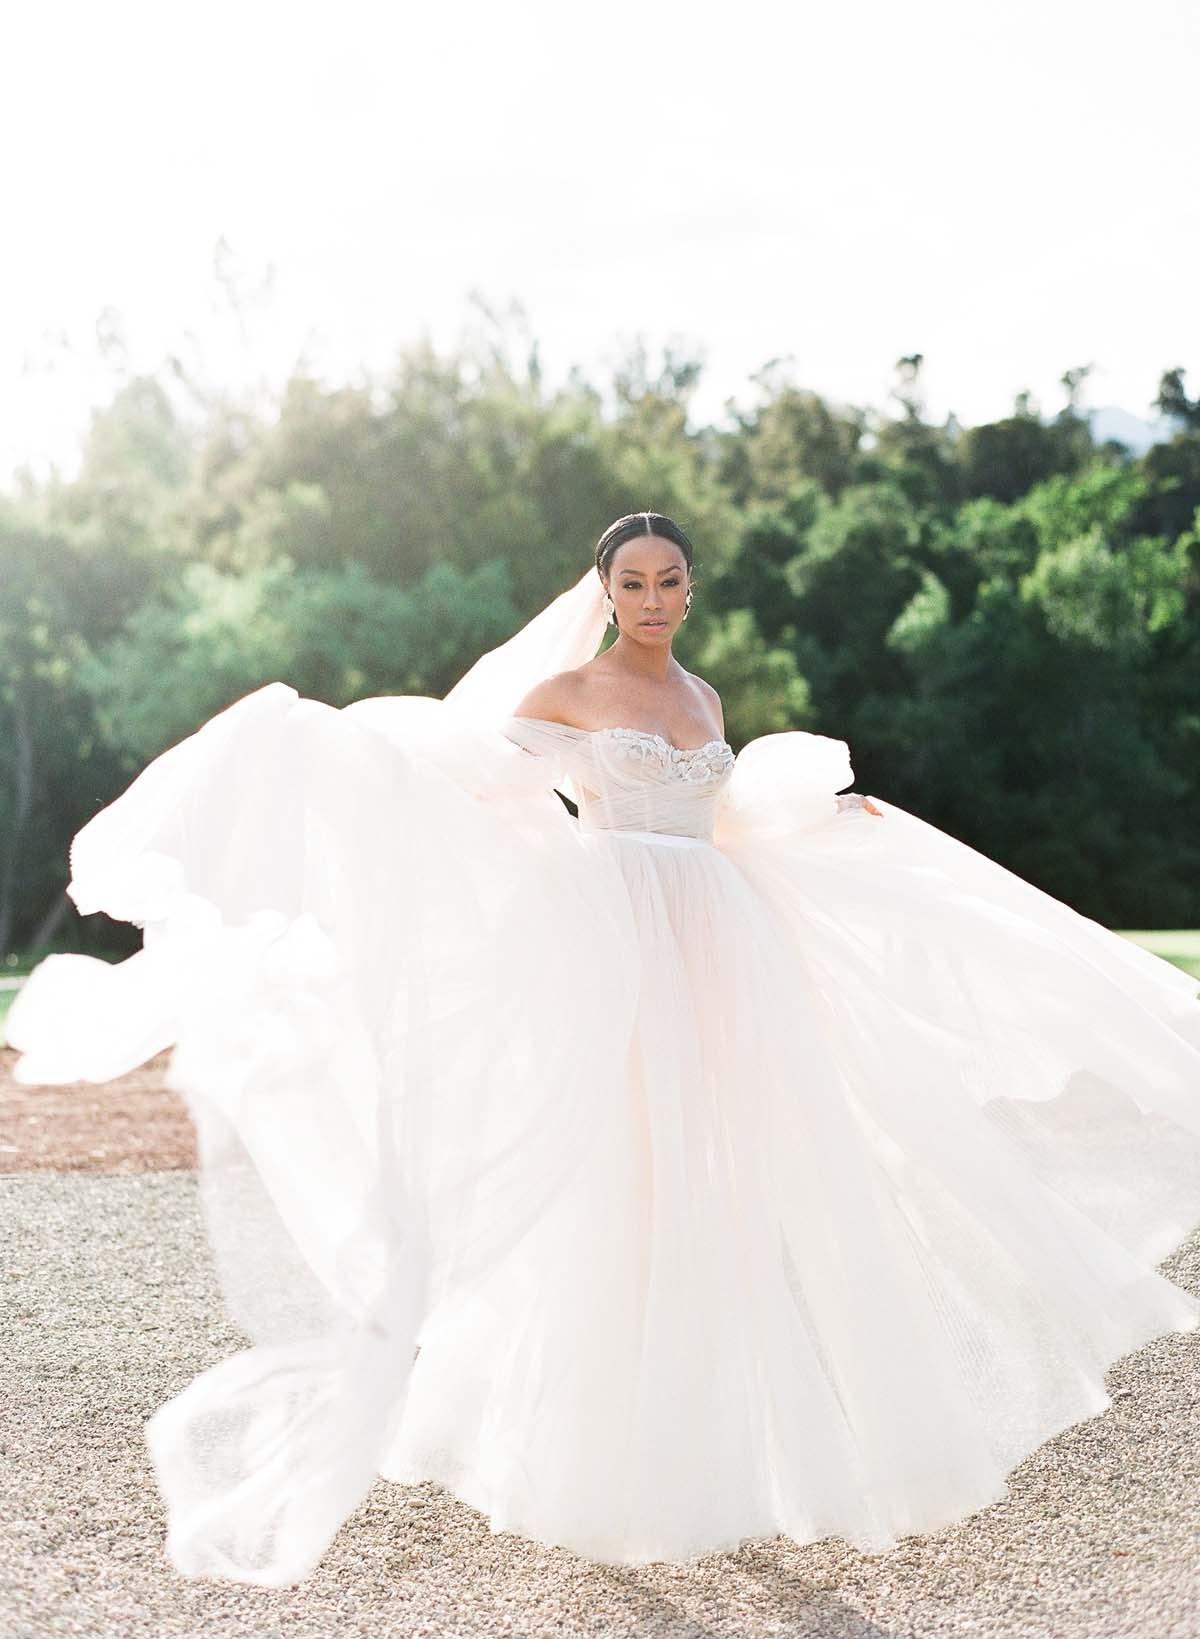 XOXO_BRIDE_Events-Michelle-Beller_Photography_0118